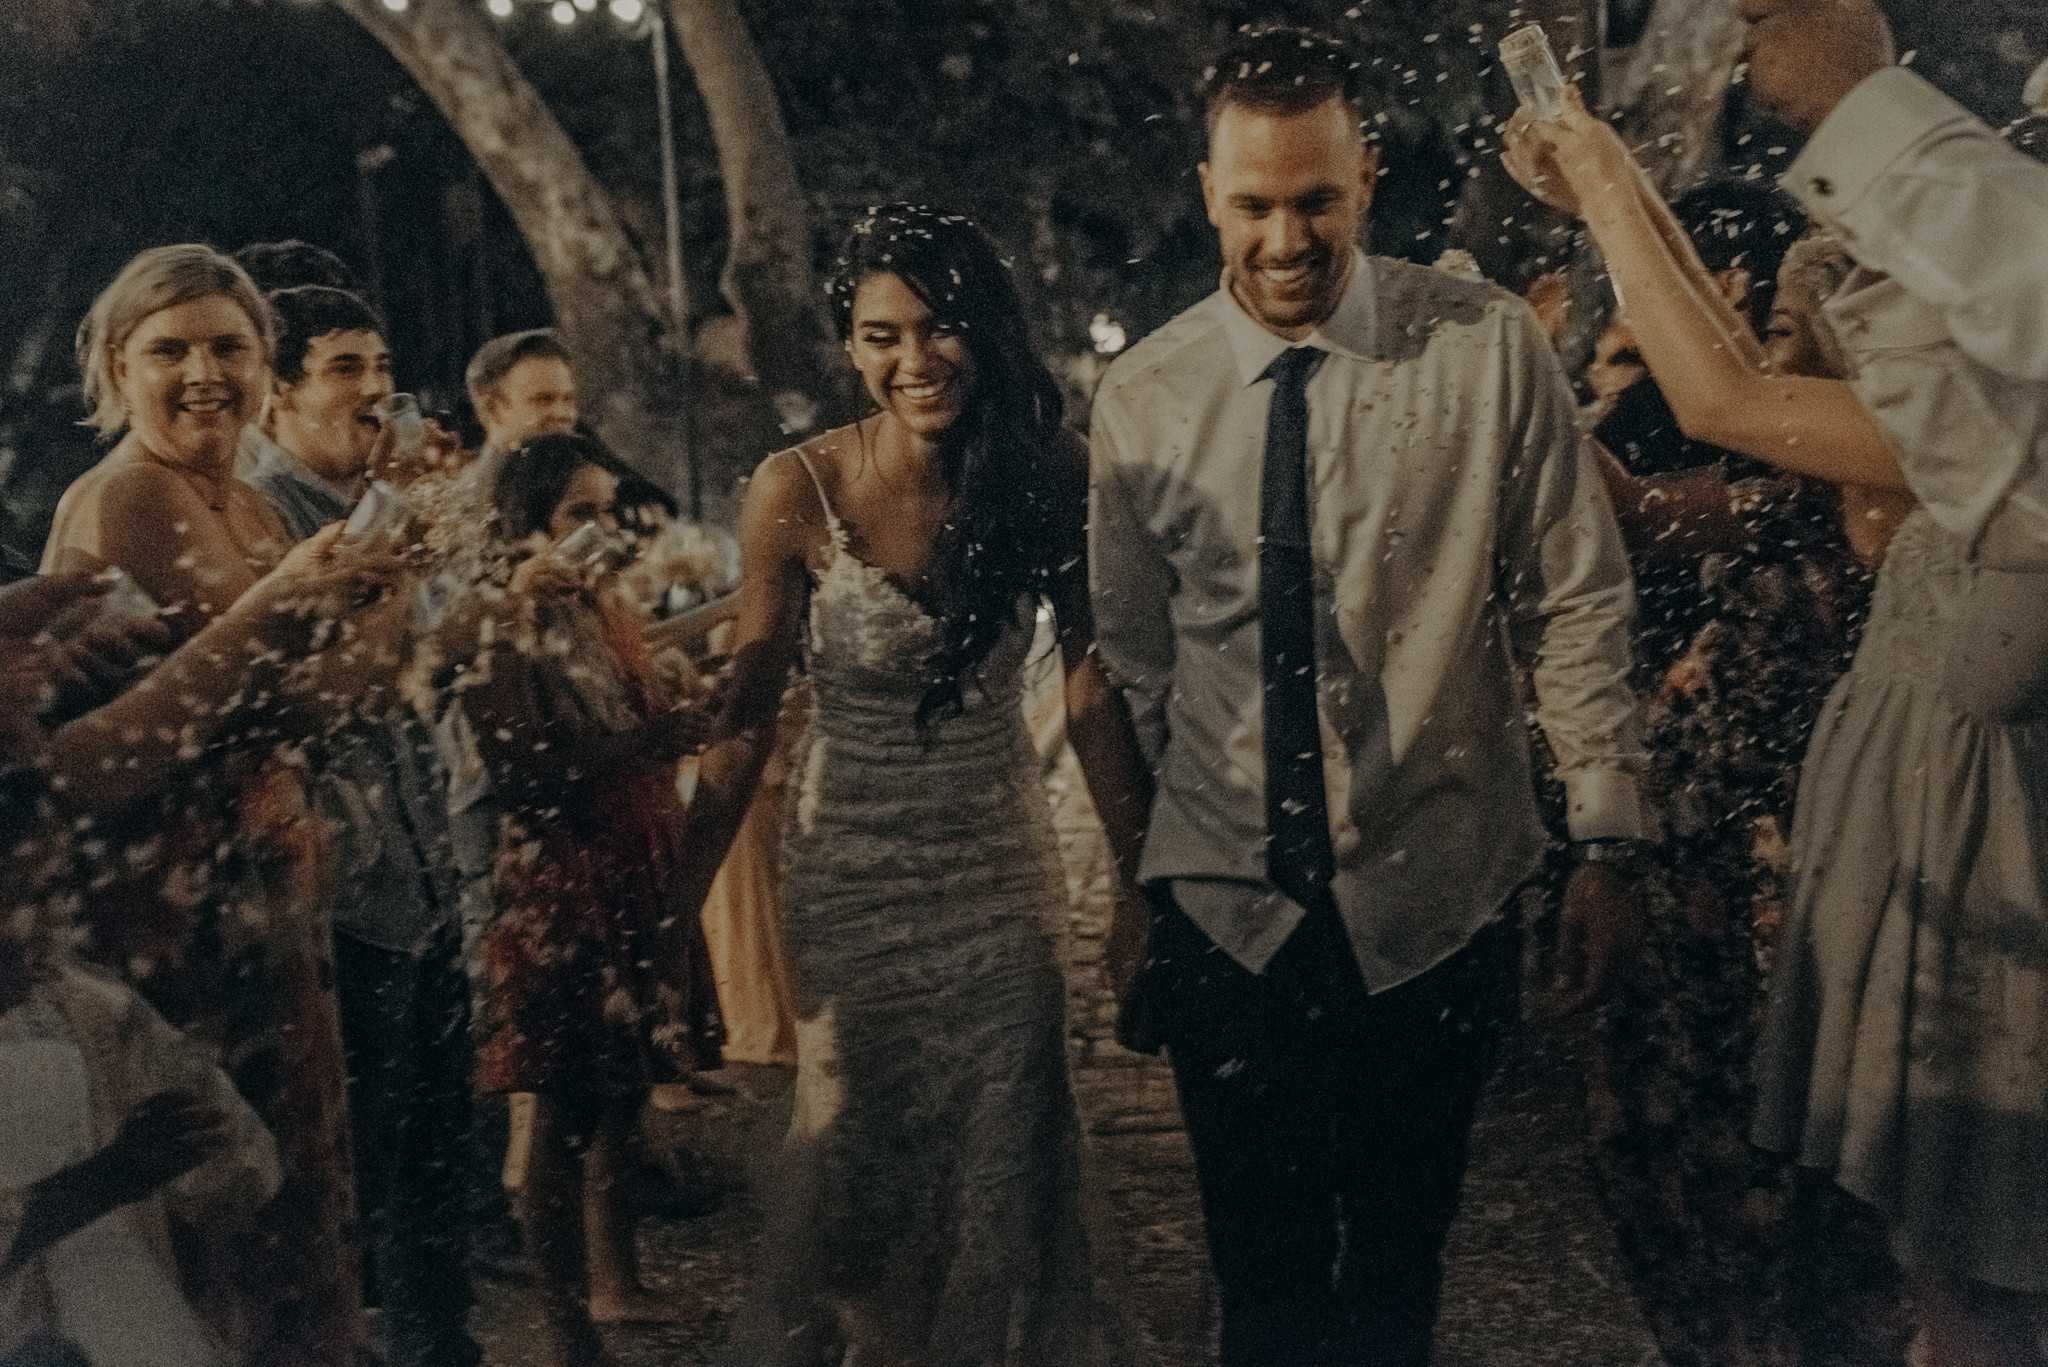 Isaiah + Taylor Photography - Rancho Las Lomas Wedding, Los Angeles Wedding Photographer-165.jpg